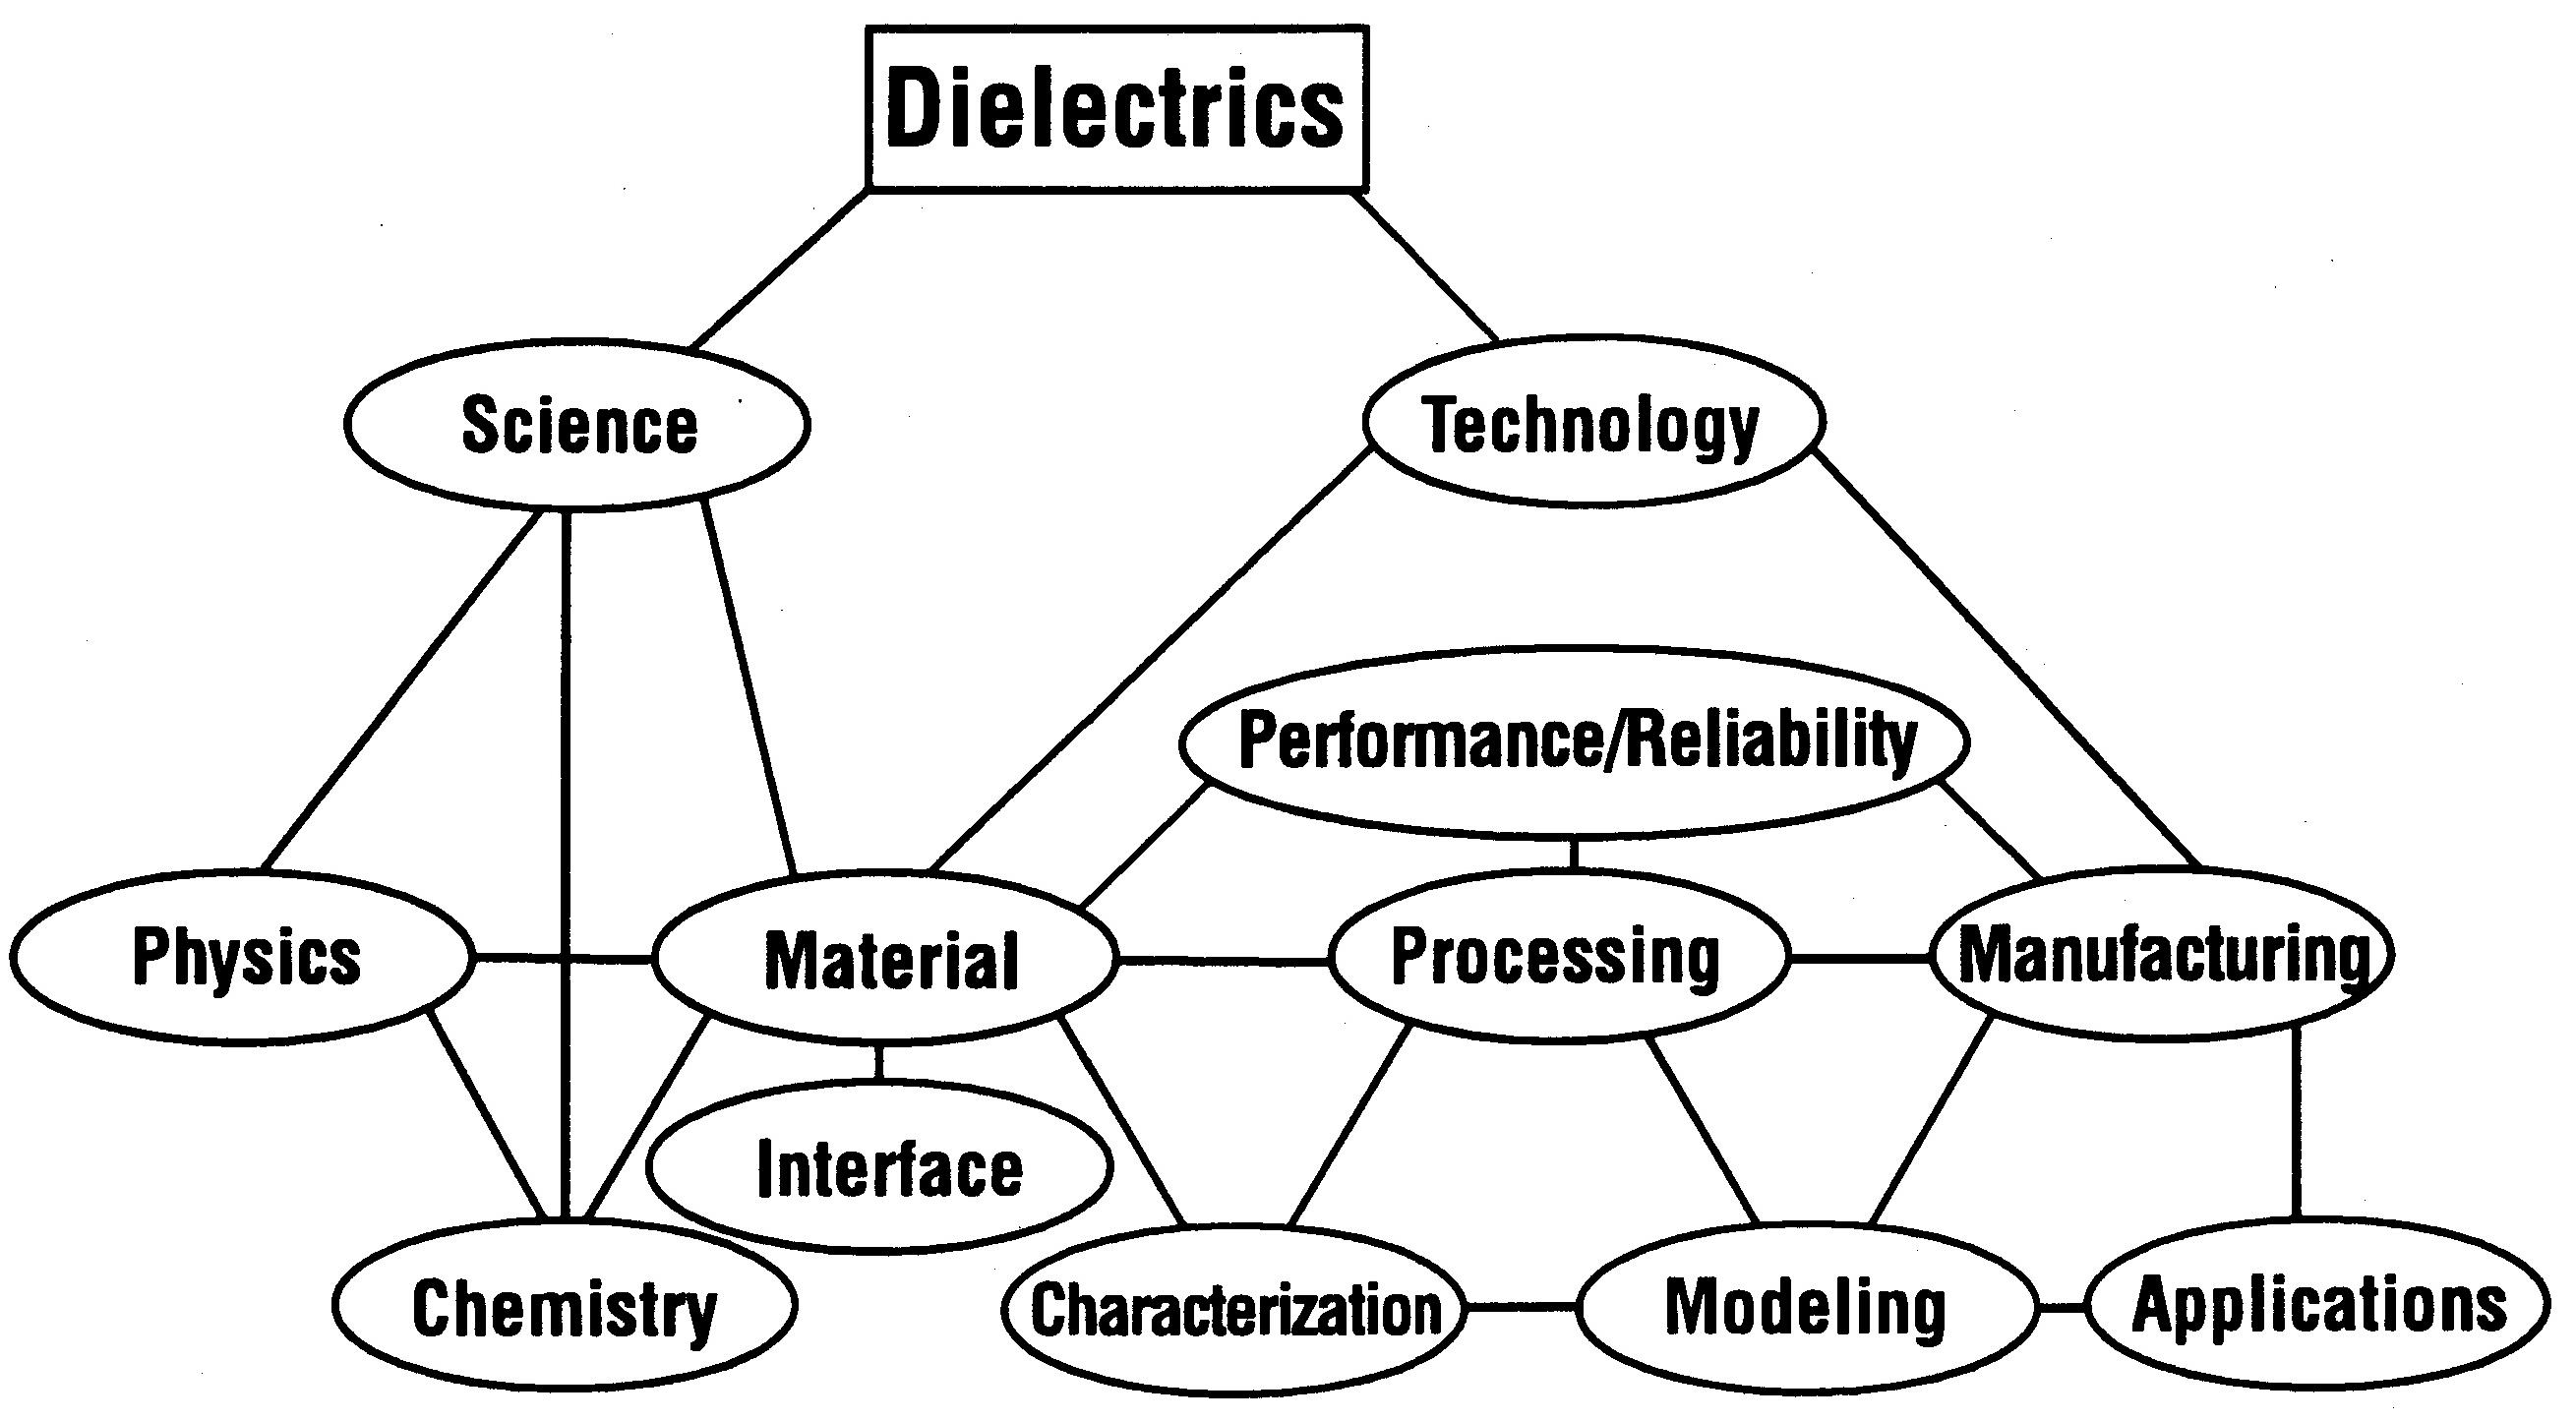 Electrochemistry Encyclopedialectrics